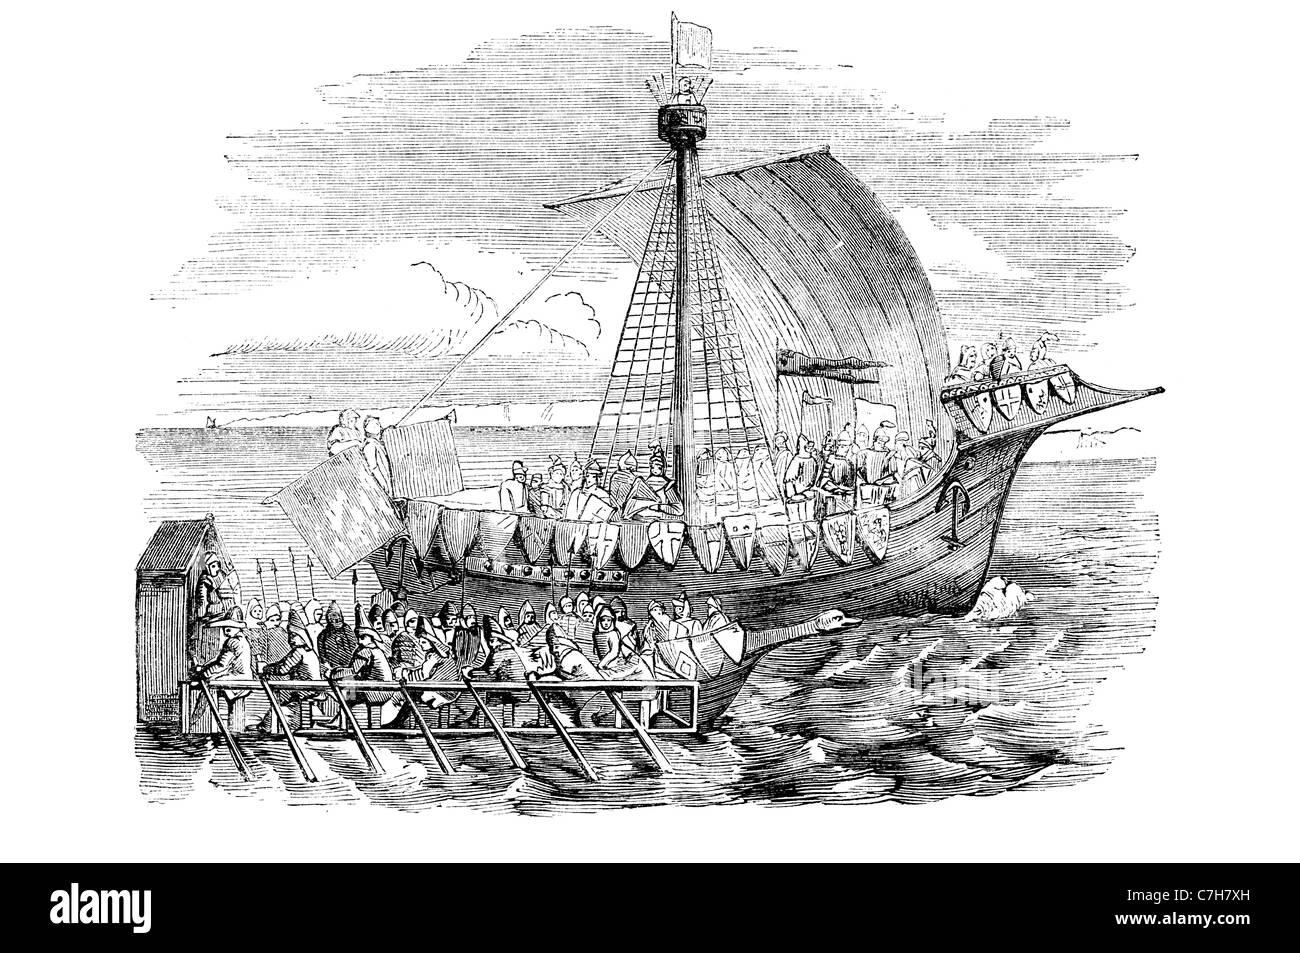 Ship of war 15th century Two decker sail warship her guns armed decks upper works forecastle quarterdeck battery - Stock Image